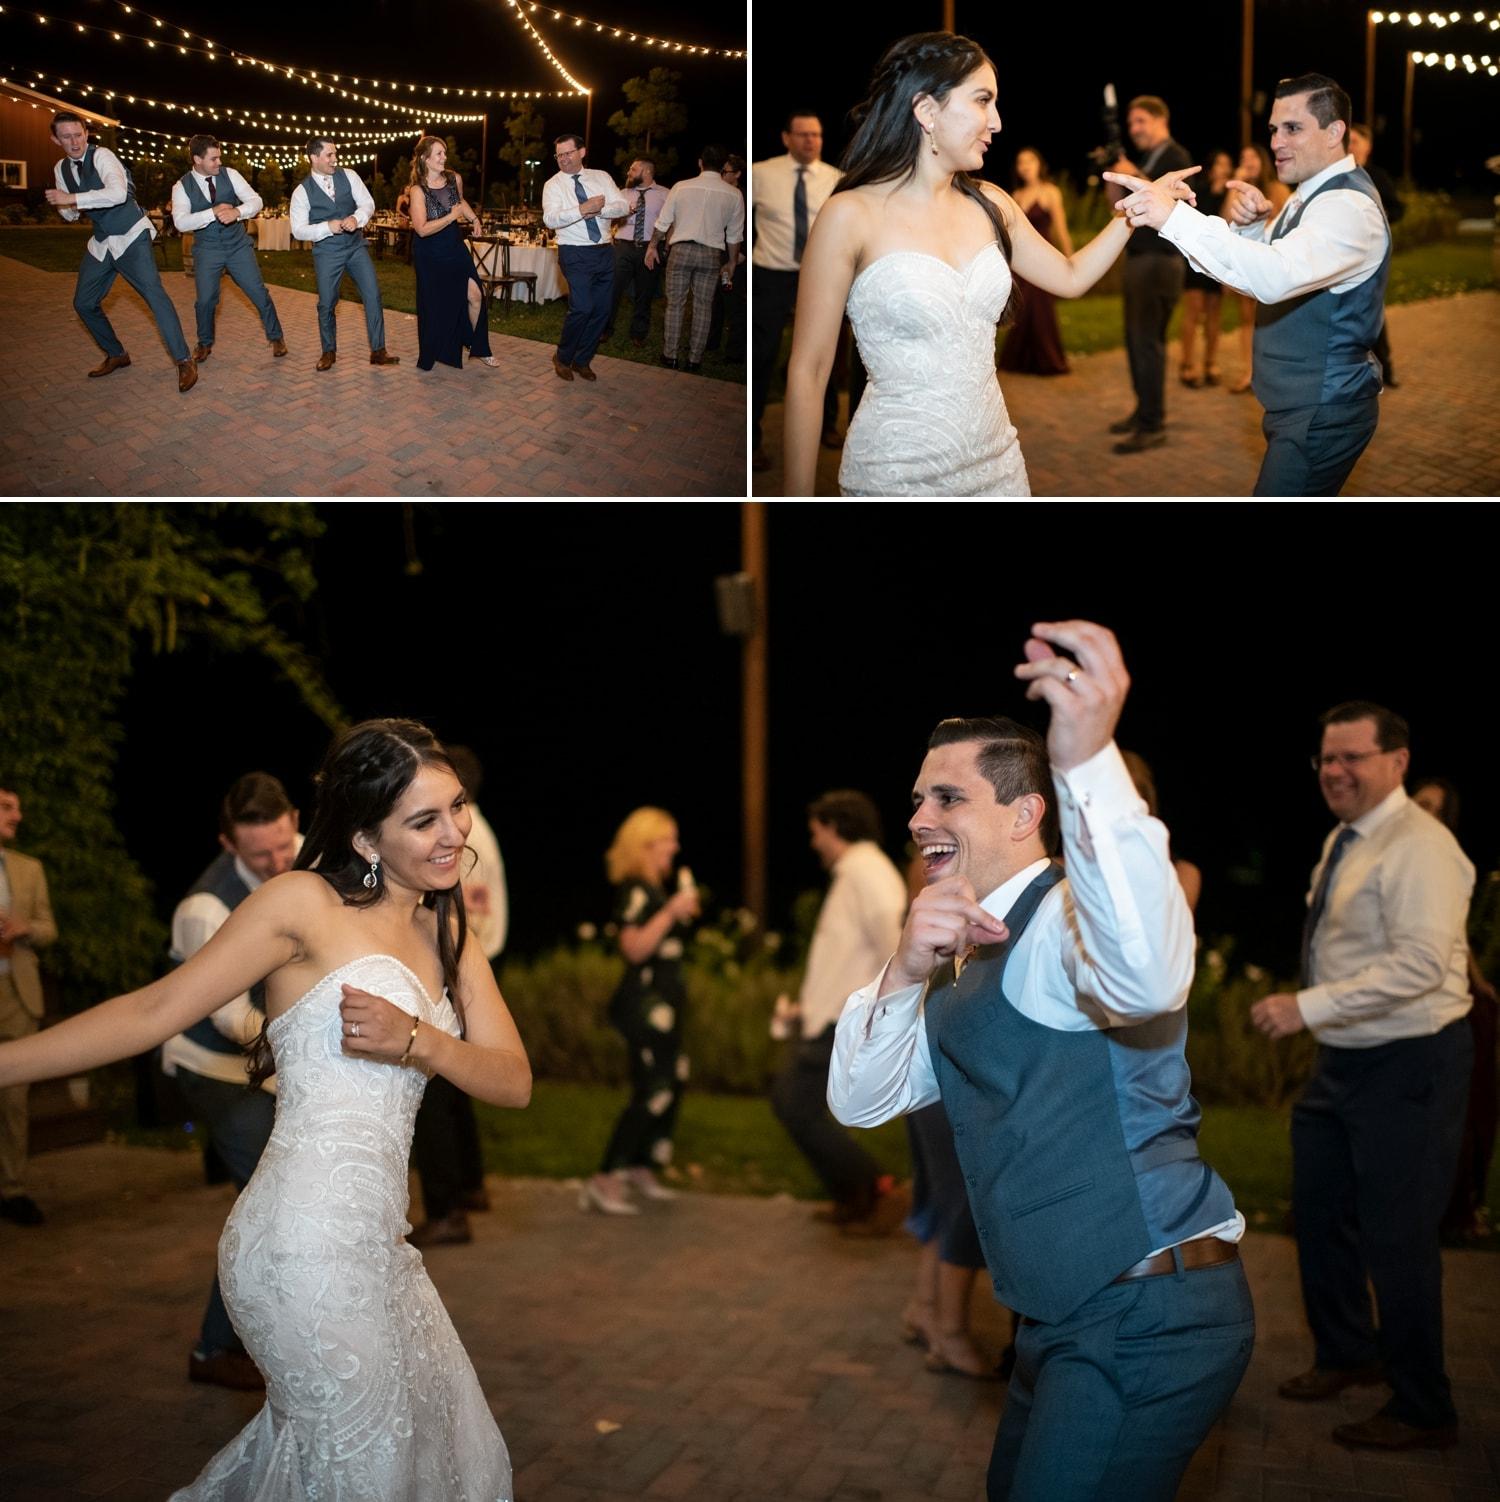 Bride and groom dancing at their wedding in Temecula.